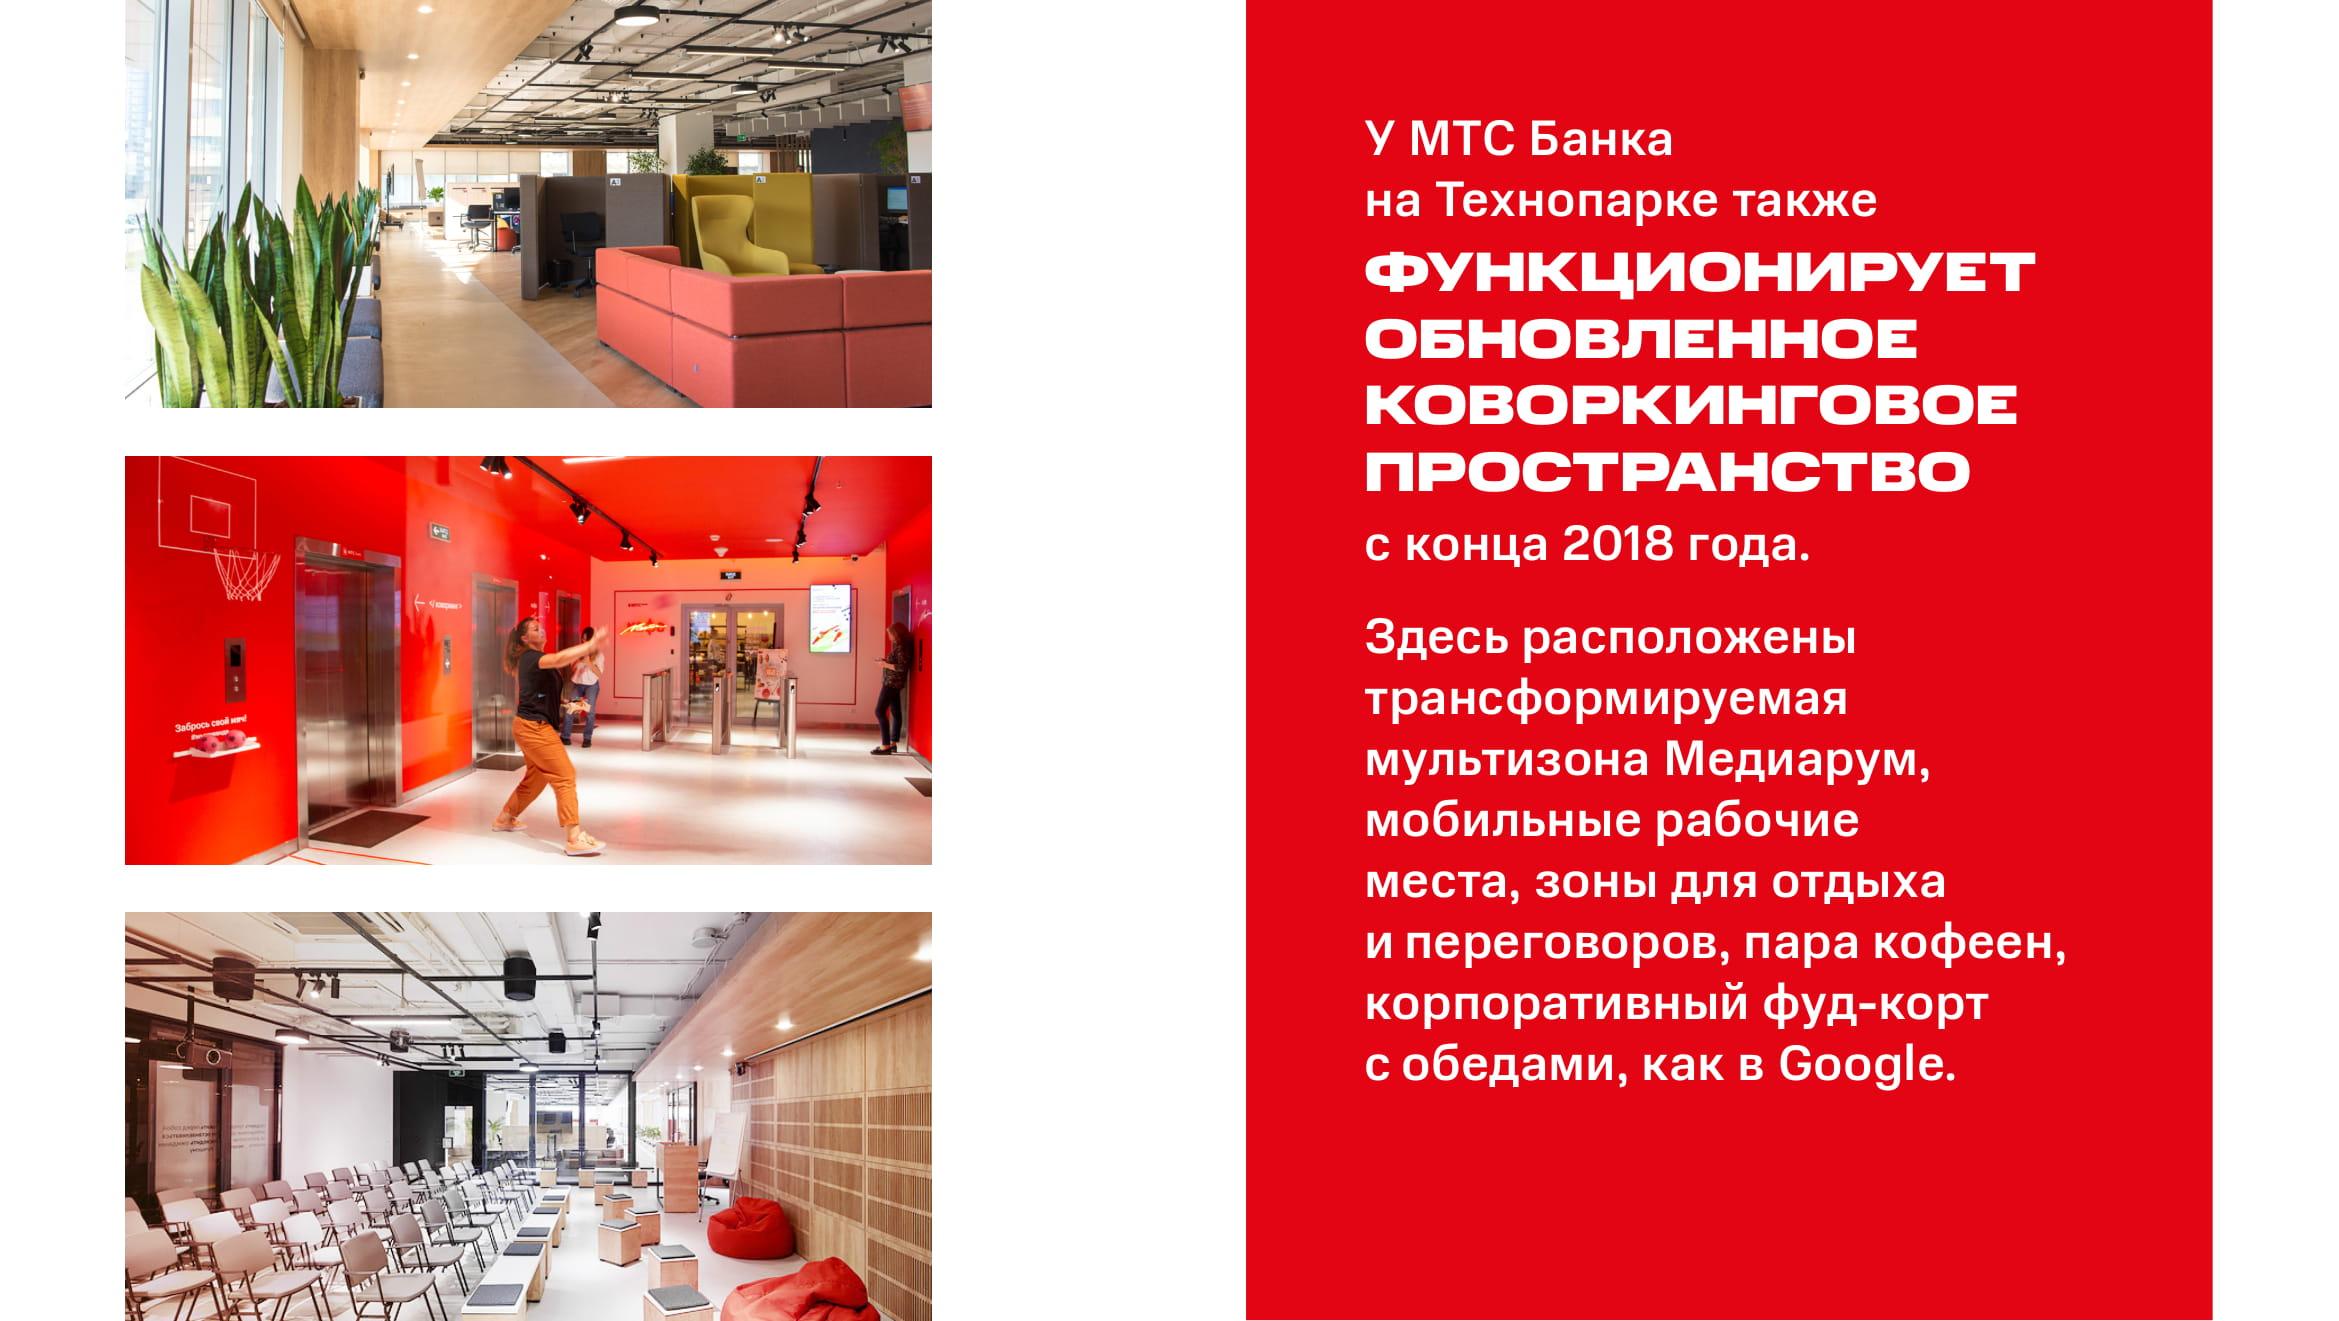 RFA_Креатив-года-2020_МТС-Банк-VS-Альфа-Банк-05